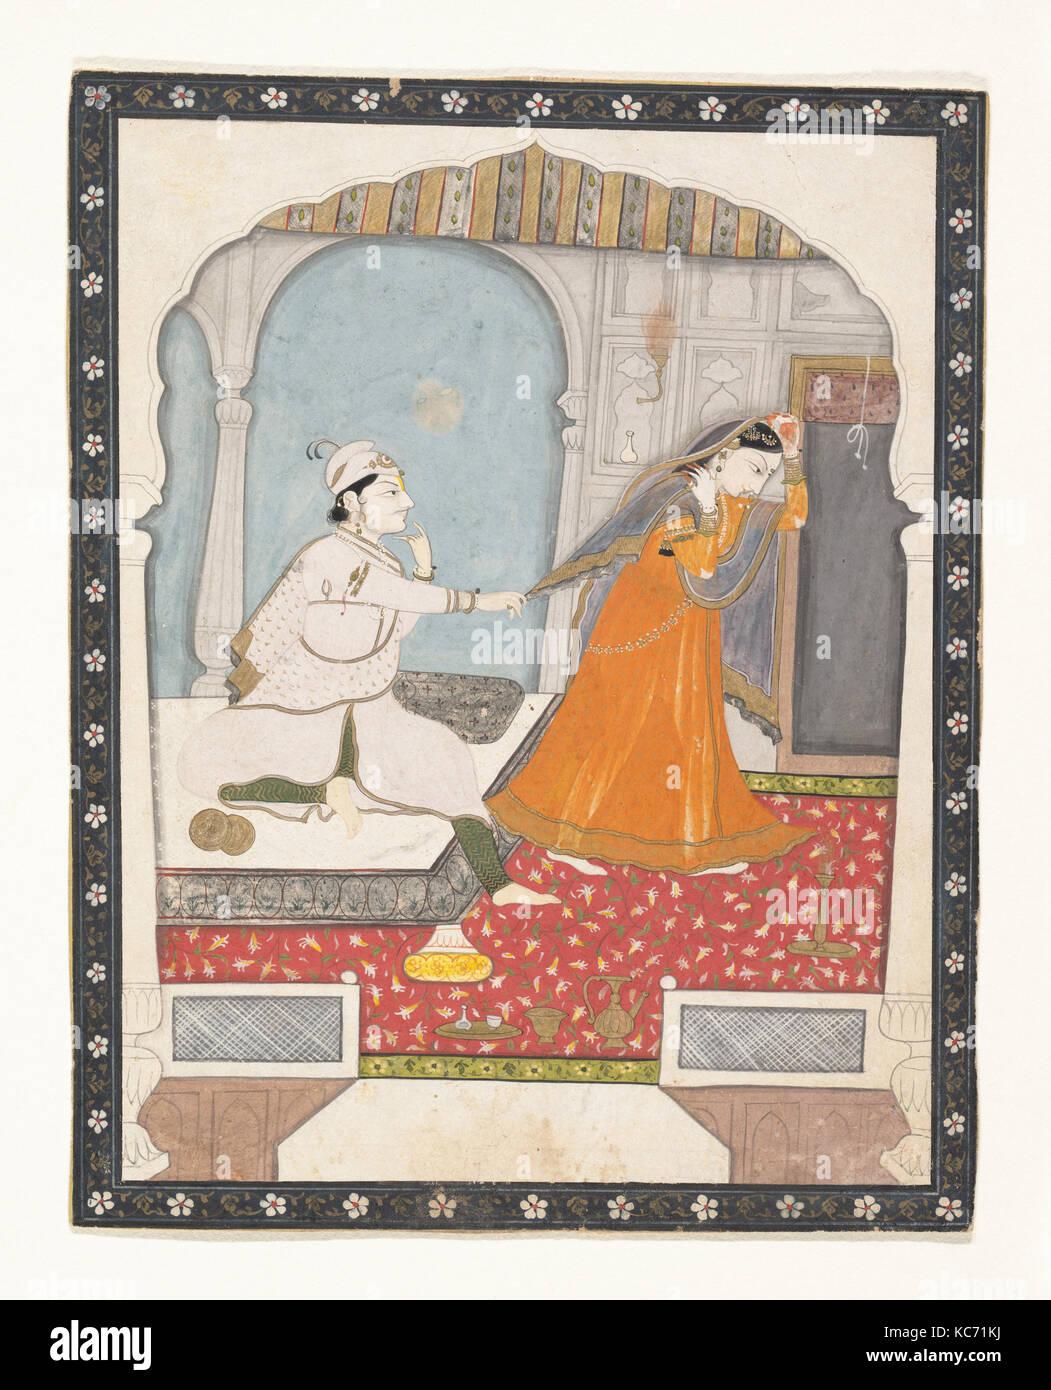 La tímida novia, ca. 1800, India (Punjab Hills, kangra), tinta, acuarela opaca y doradas sobre papel, 7 1/4 Imagen De Stock